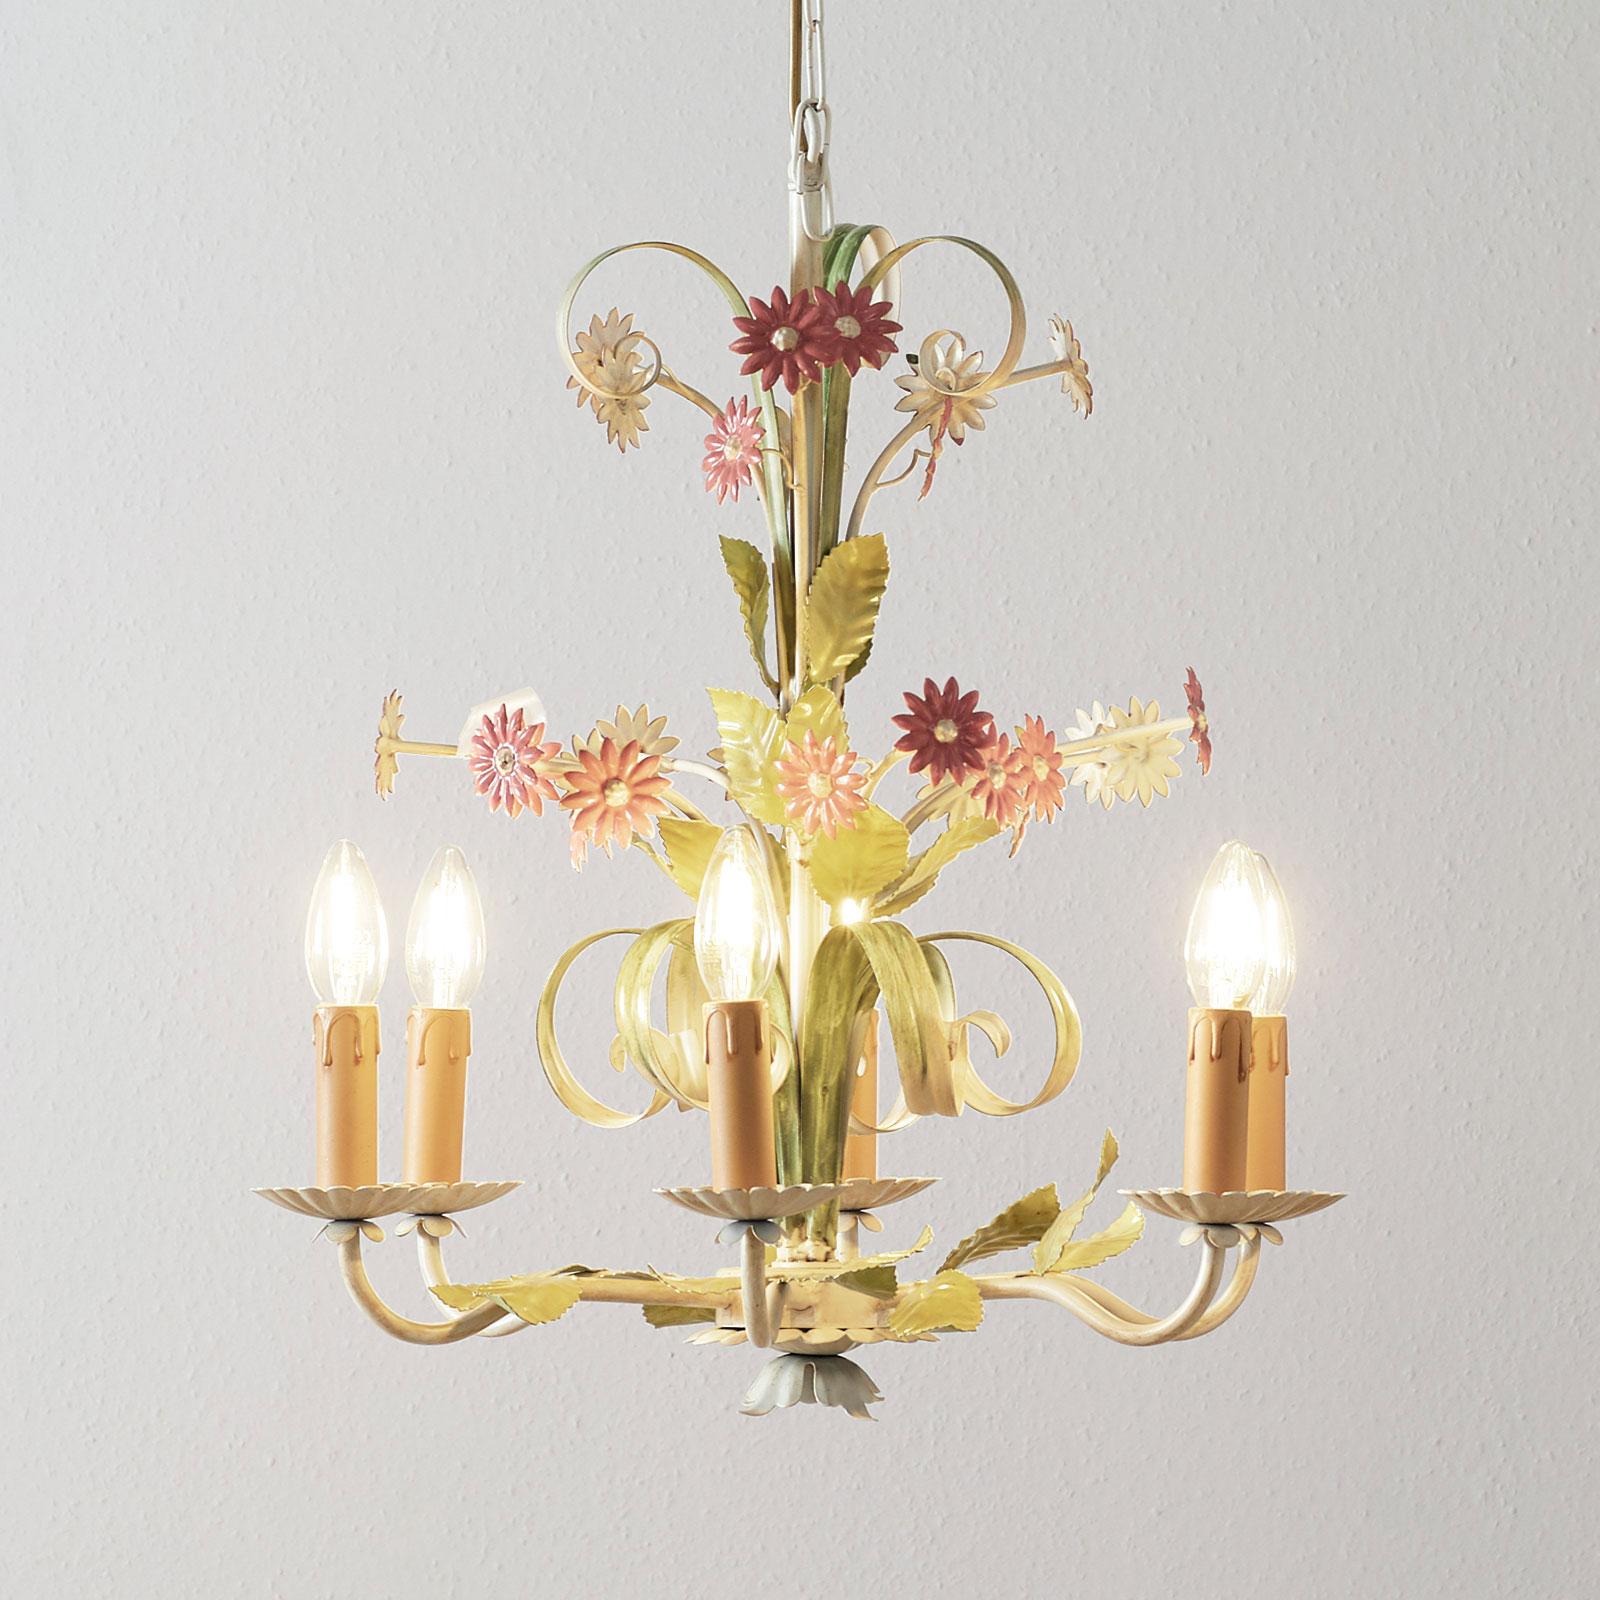 Florentinsk ljuskrona Toscana, 6 lampor